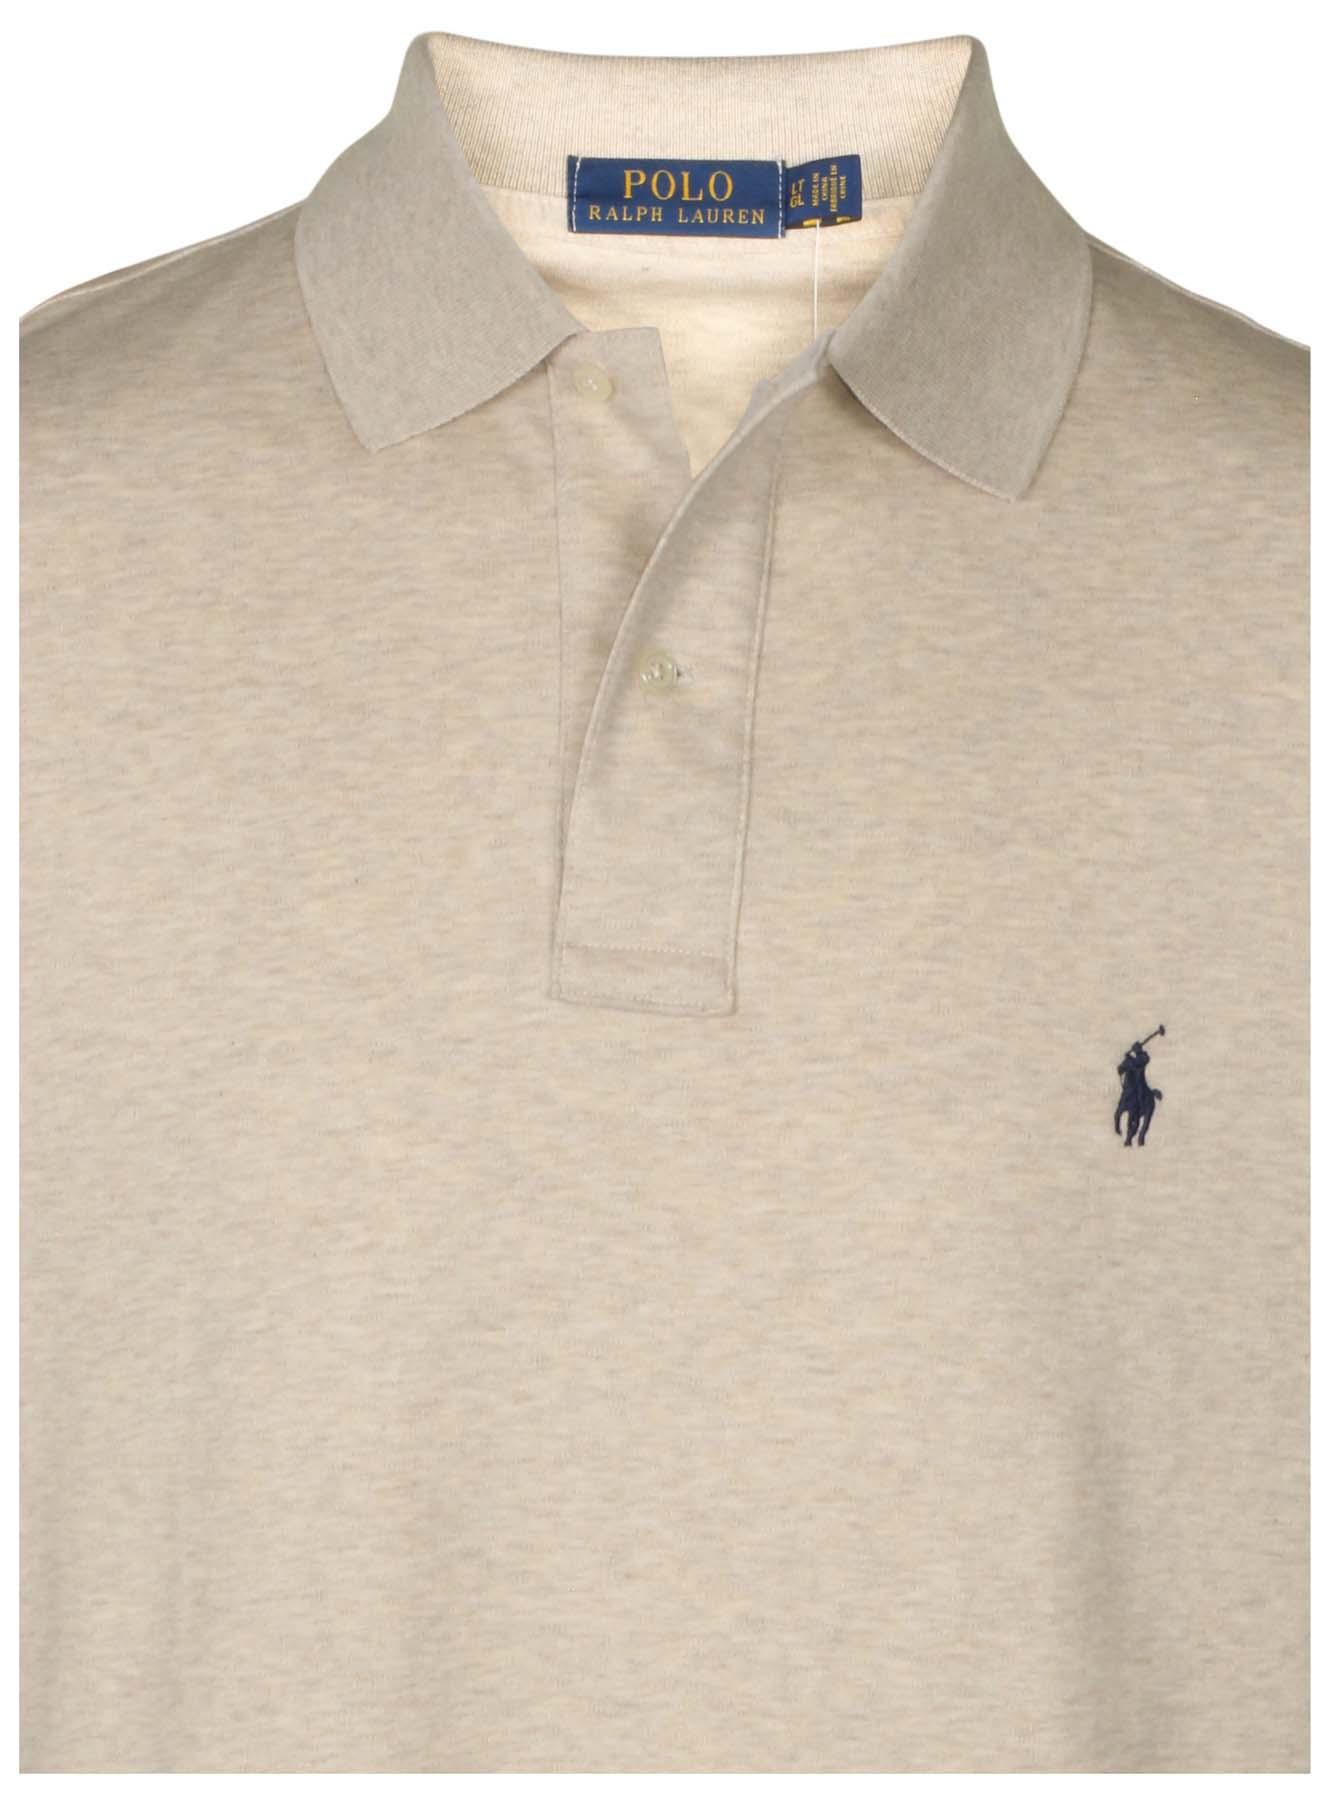 Polo Ralph Lauren Mens Big Tall Interlock Polo Shirt Ebay